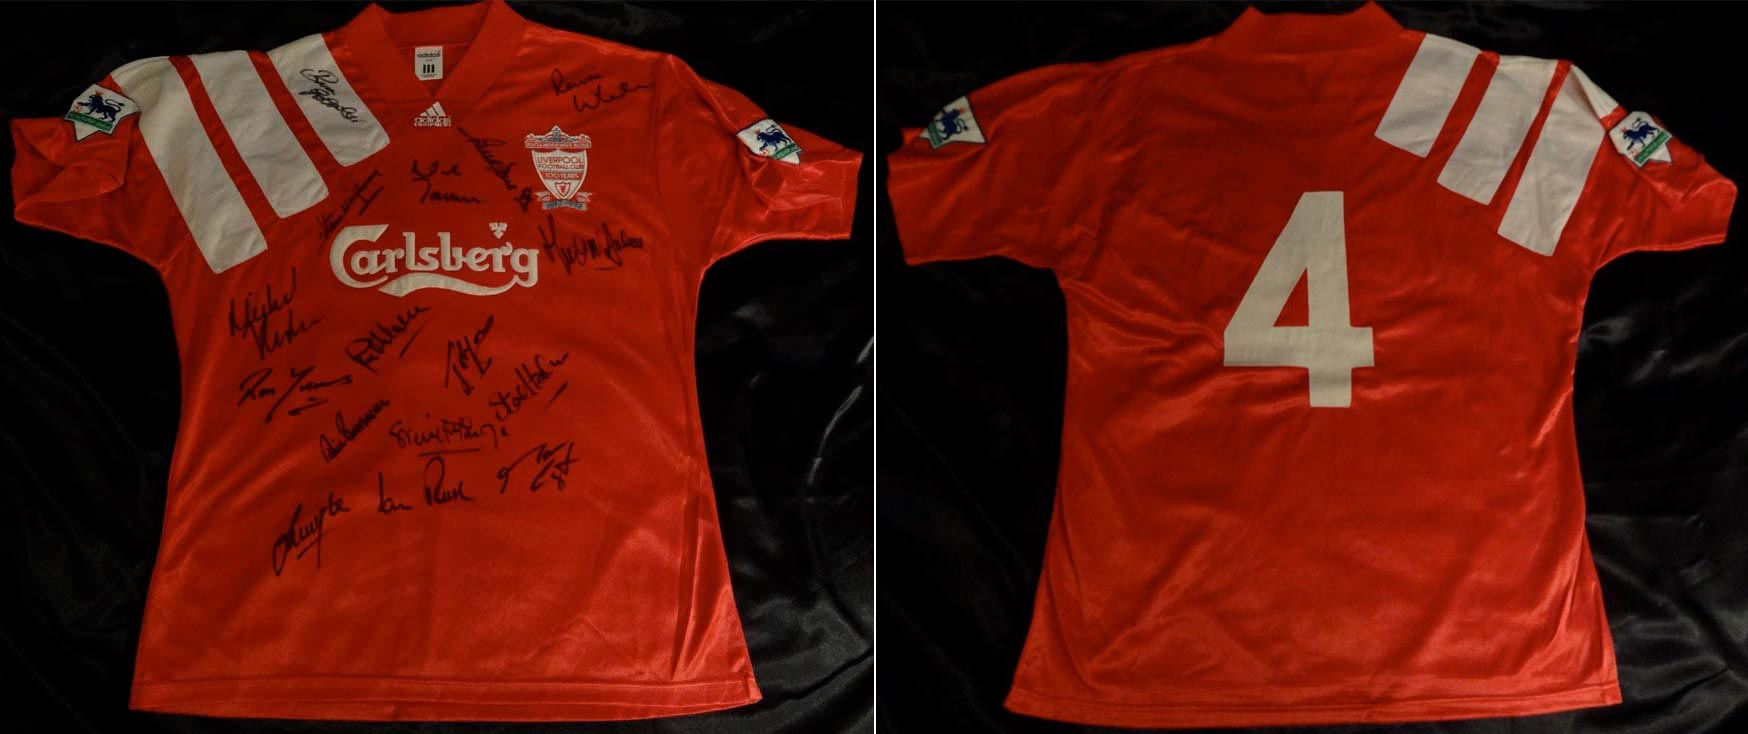 40cdb4bdf25 1992-93 Premier League Home player shirt short sleeve № 4 Steve Nicol  (patches Premier League